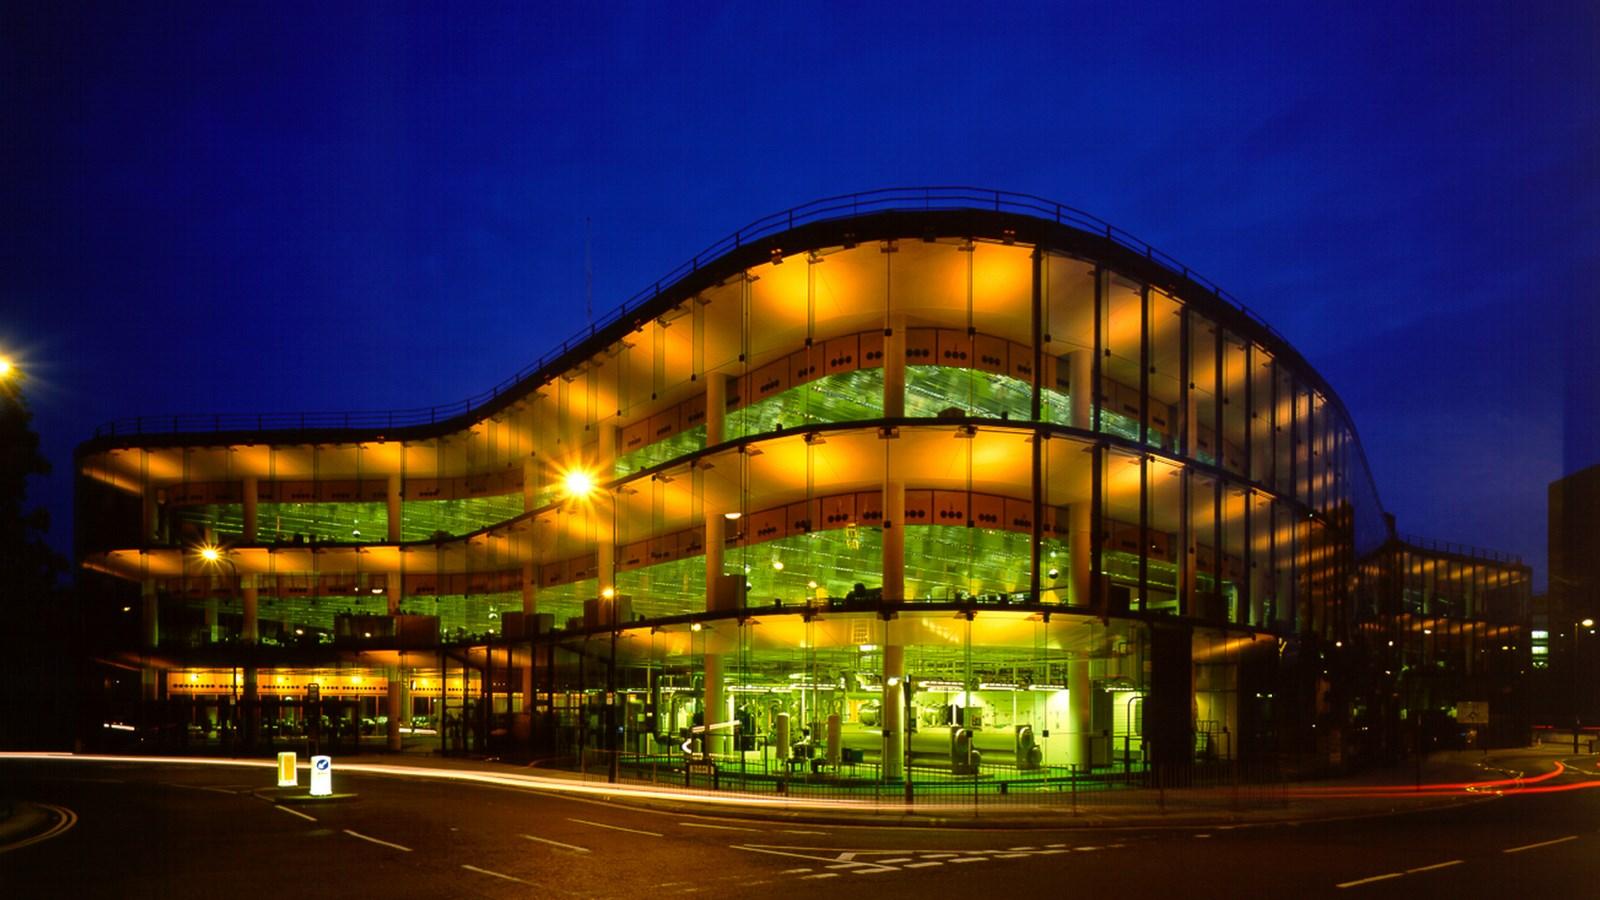 1975 - Willis, Faber & Dumas, Sede, Ipswich, Inglaterra